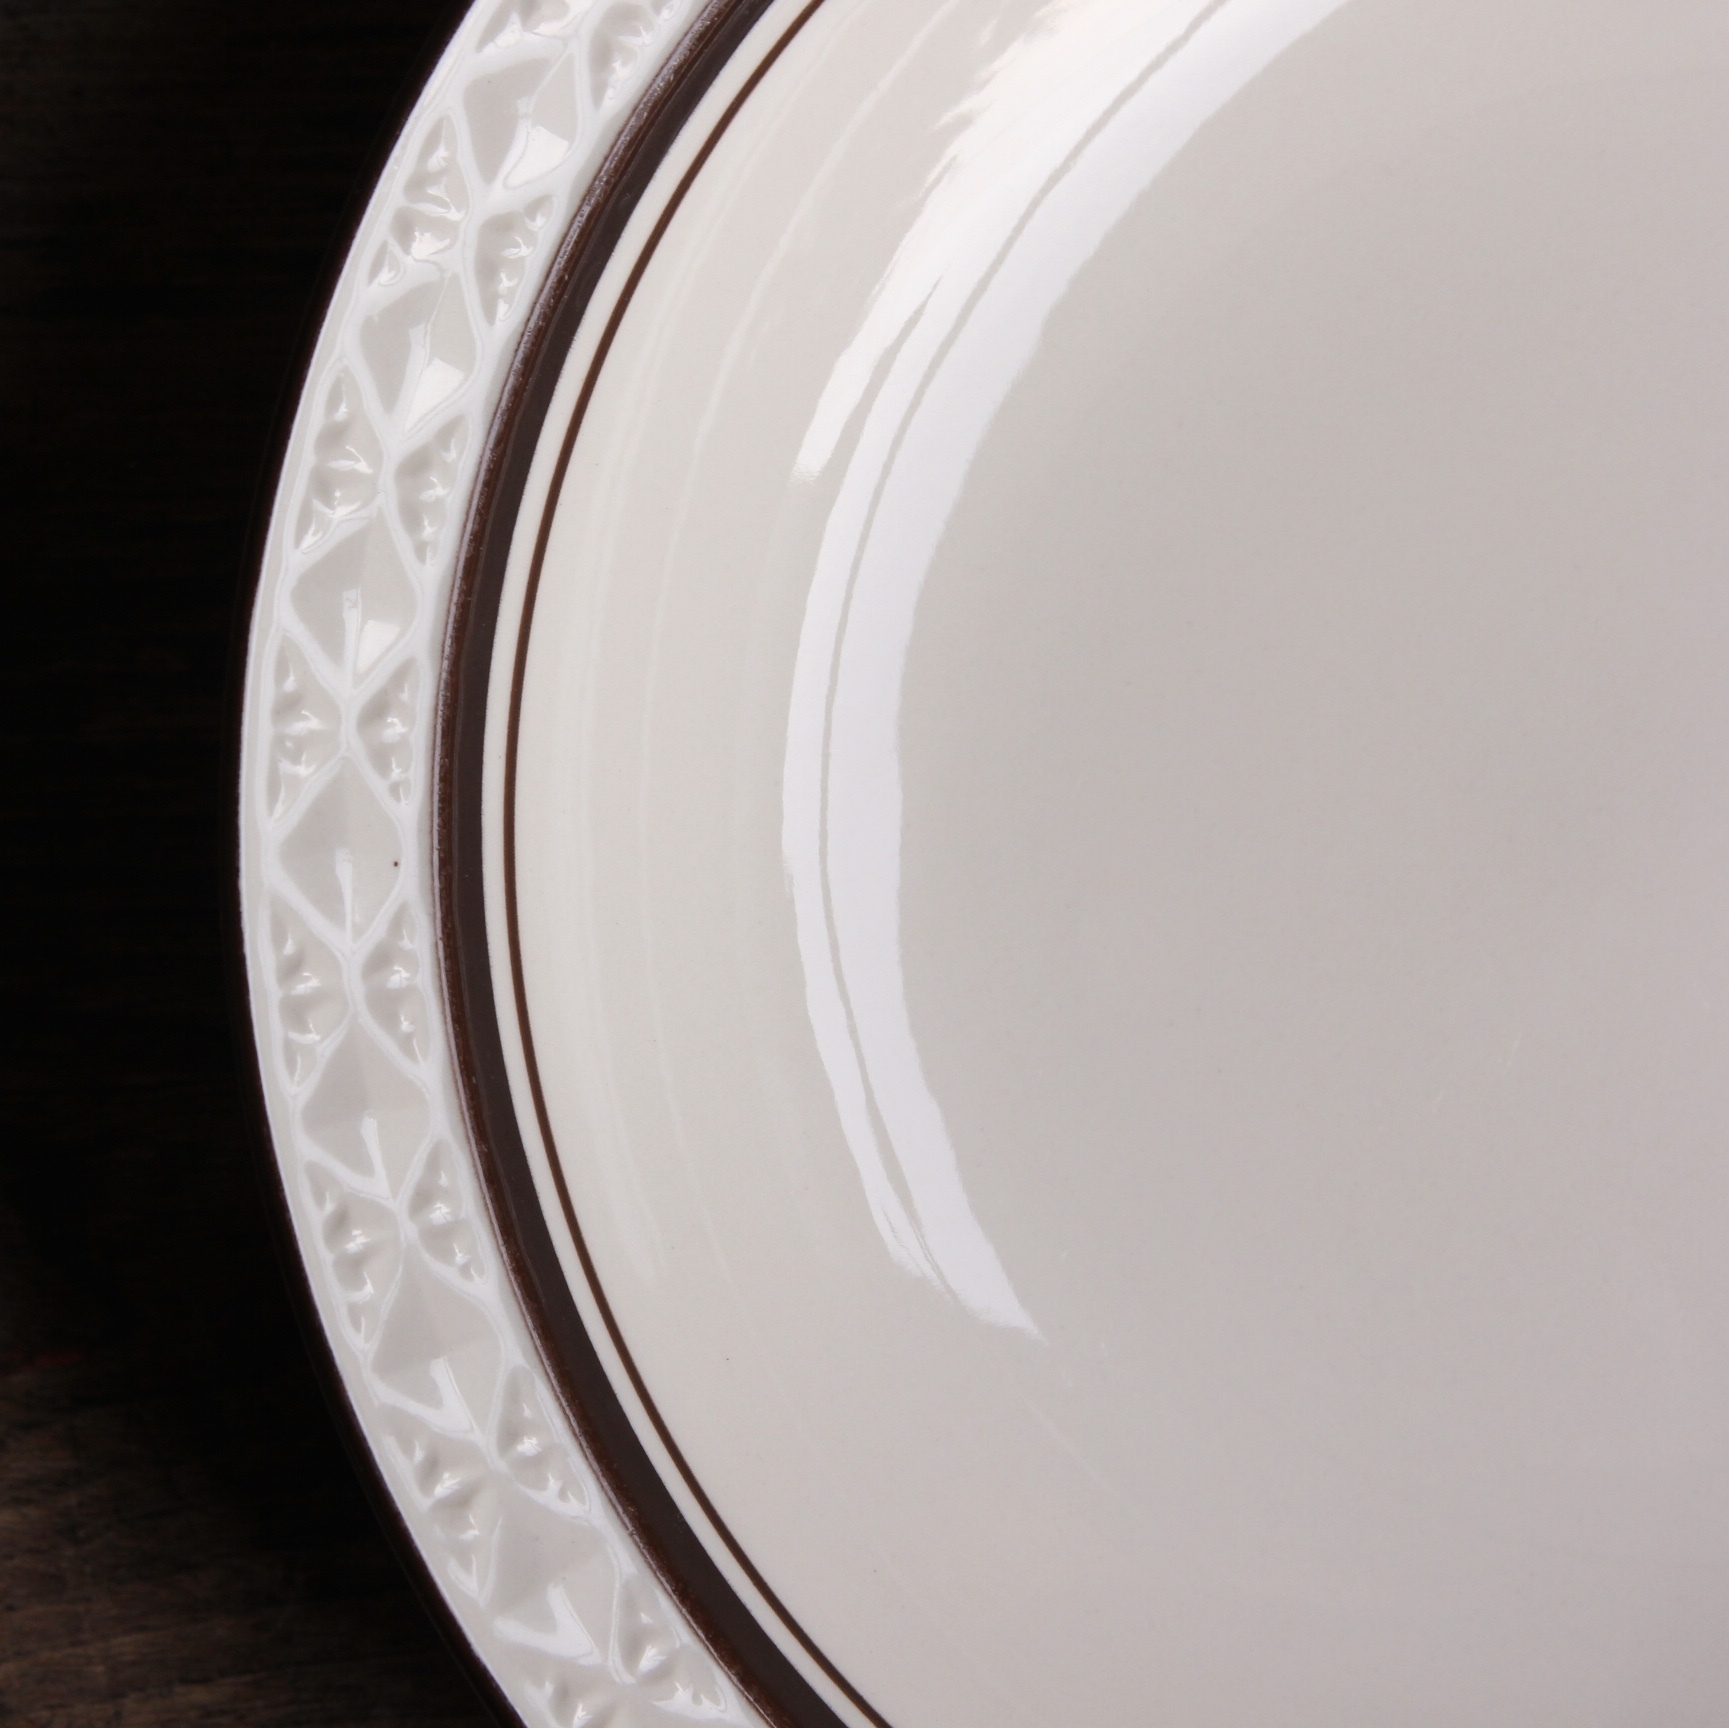 charcoal chateau カレー皿 在庫1枚